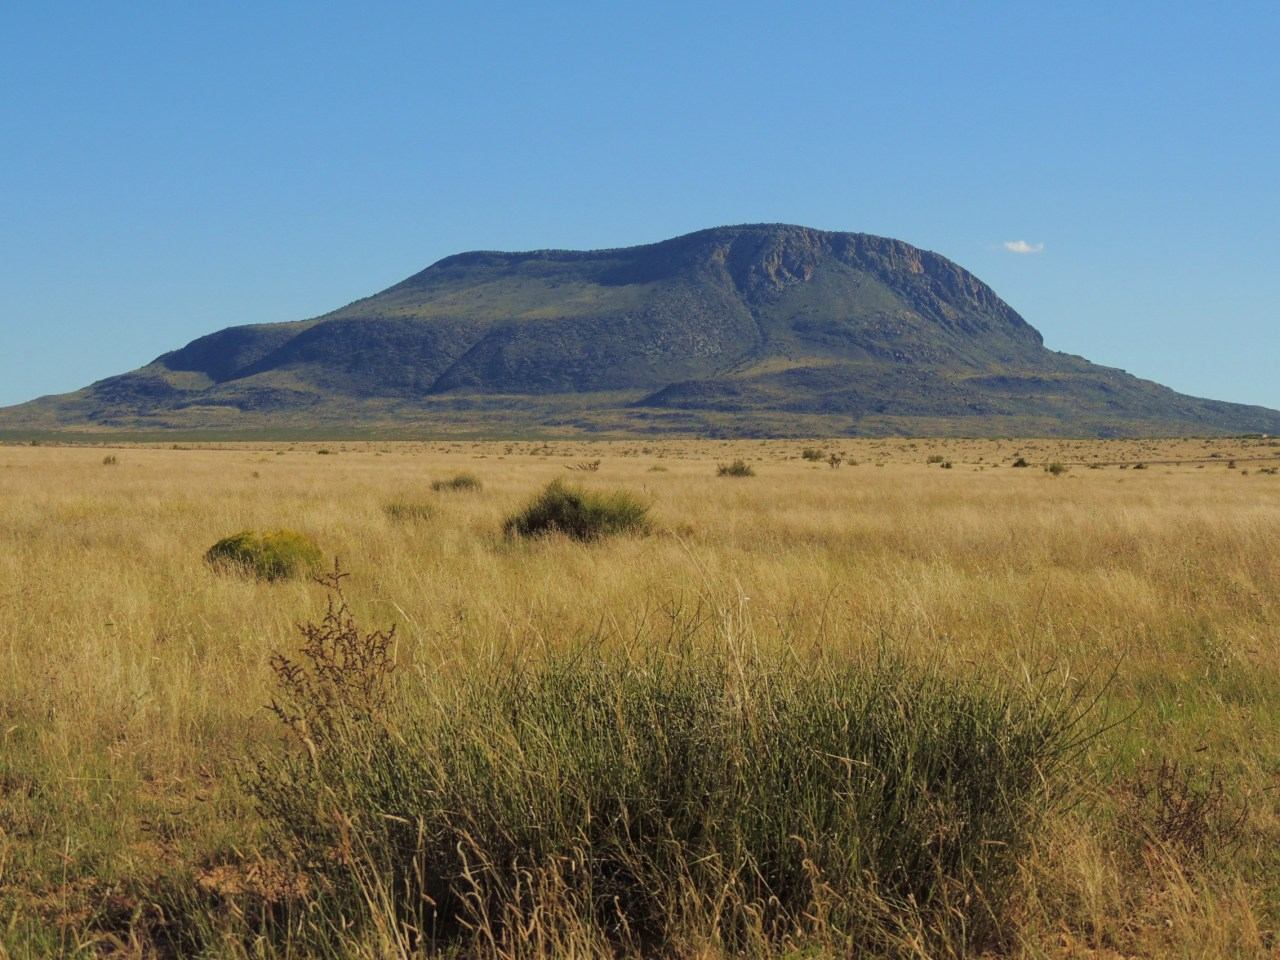 otero mesa the last pristine desert grassland the. Black Bedroom Furniture Sets. Home Design Ideas